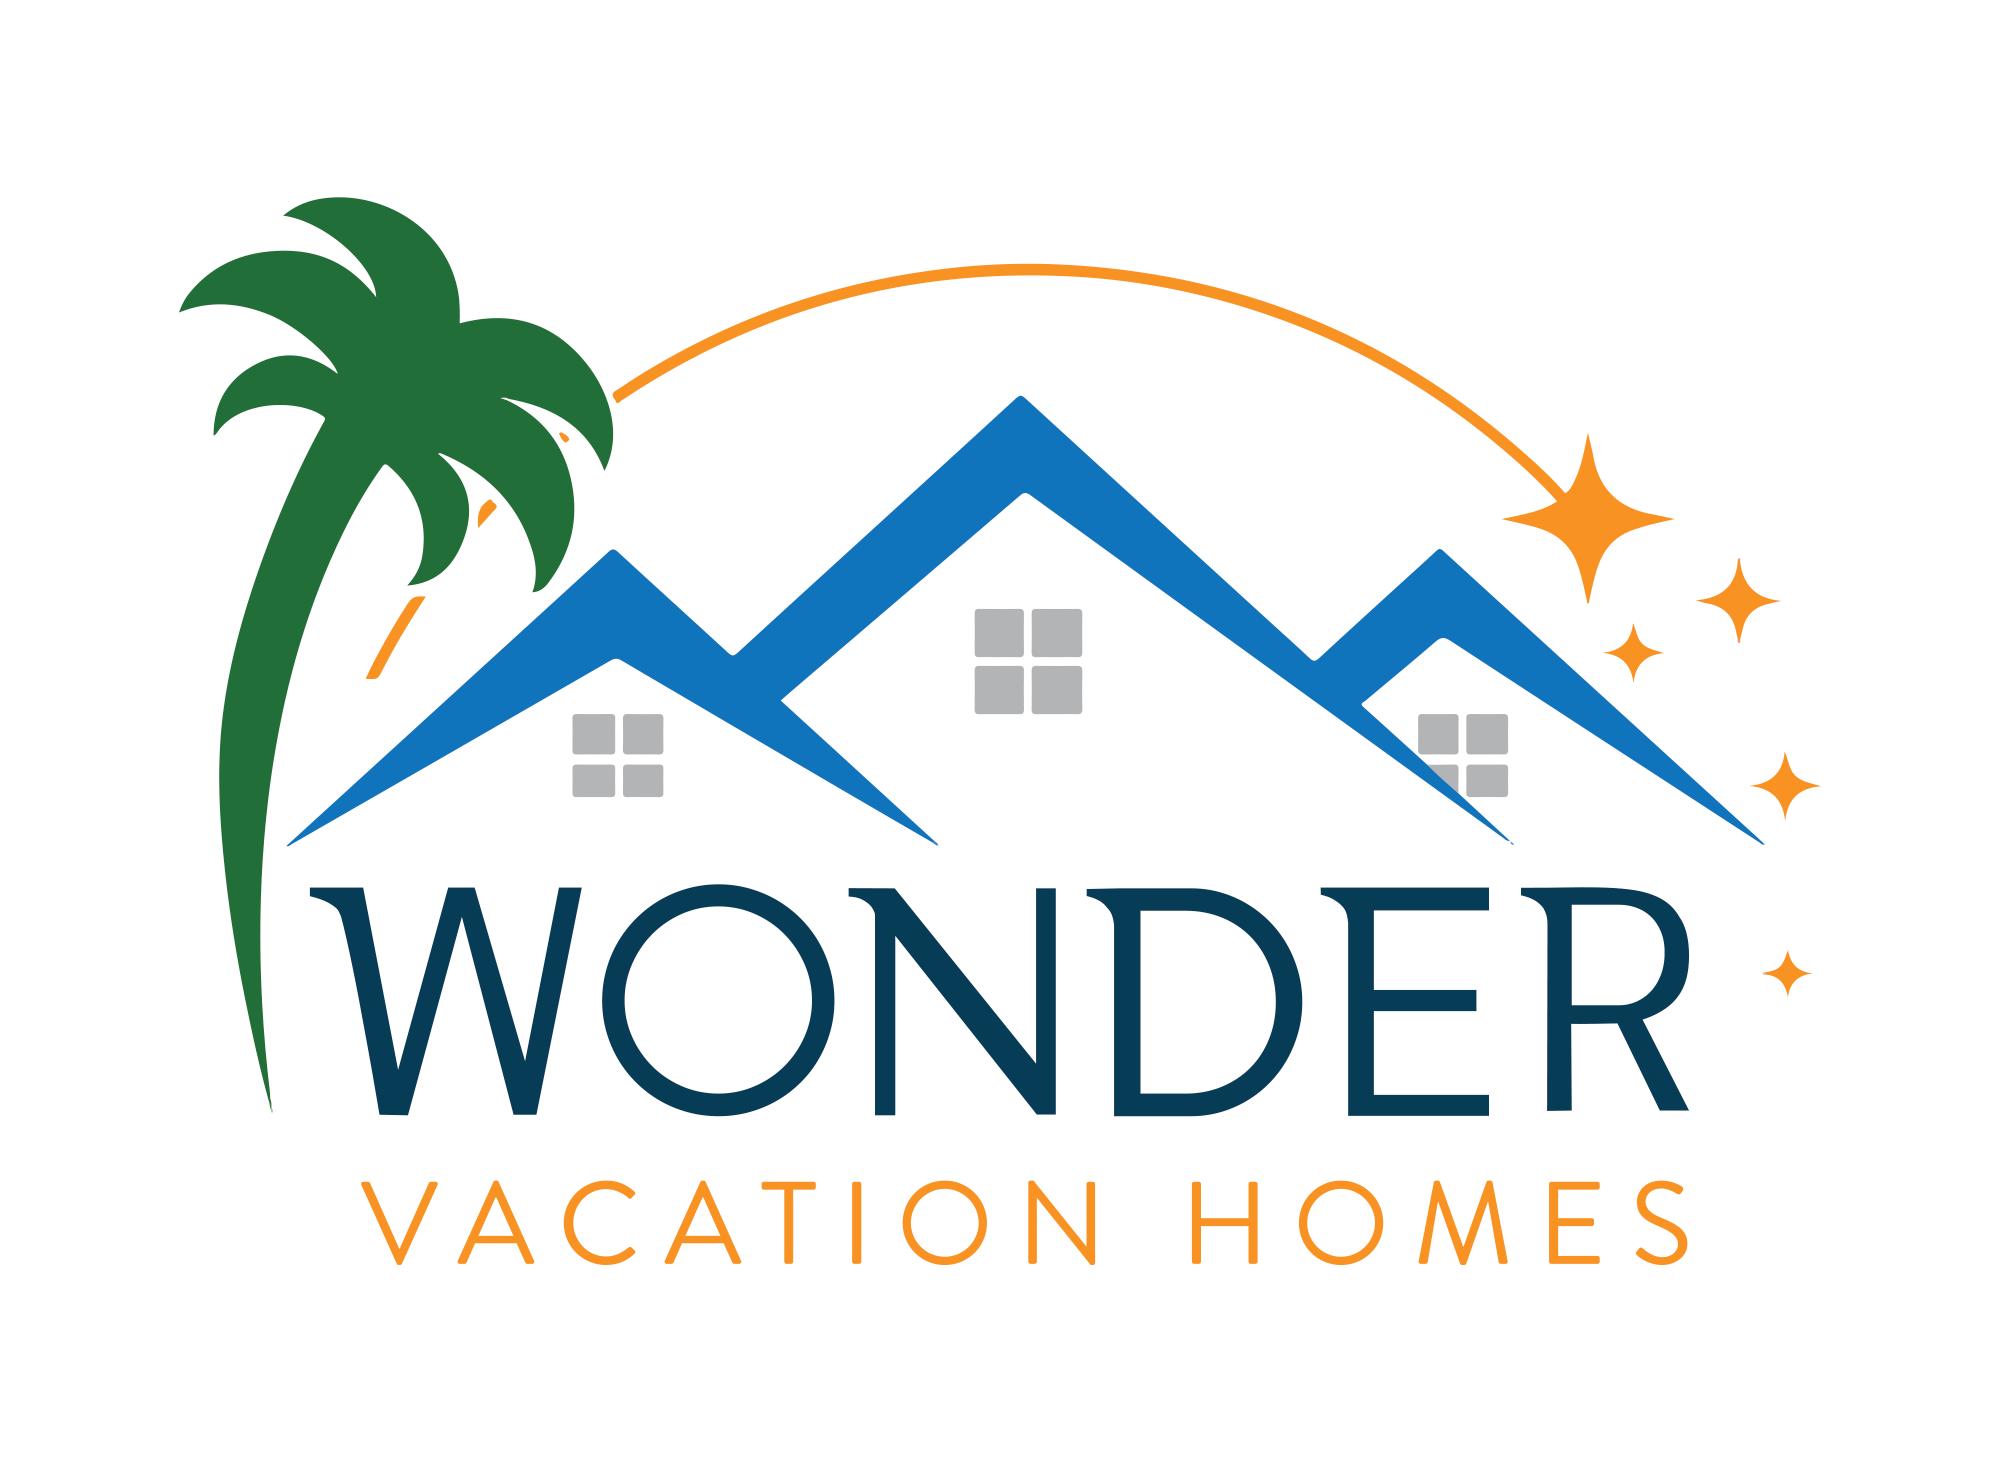 wonder-vacation-homes-clientes-agencia-diretriz-digital-marketing-fortaleza